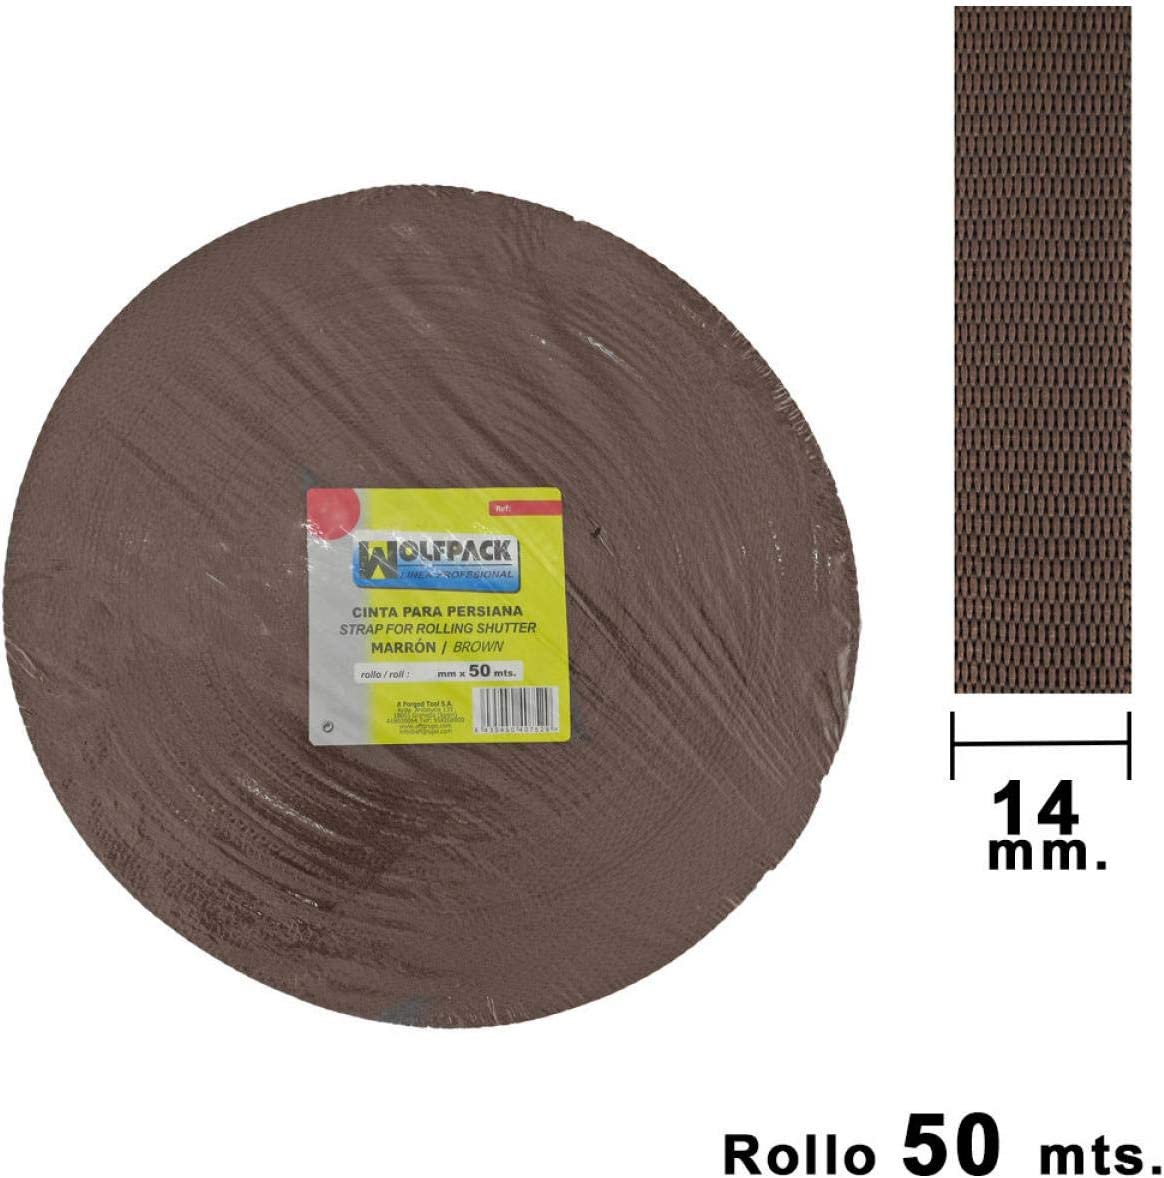 rollo 50 metros Wolfpack 5250005 Cinta persiana 14 mm gris